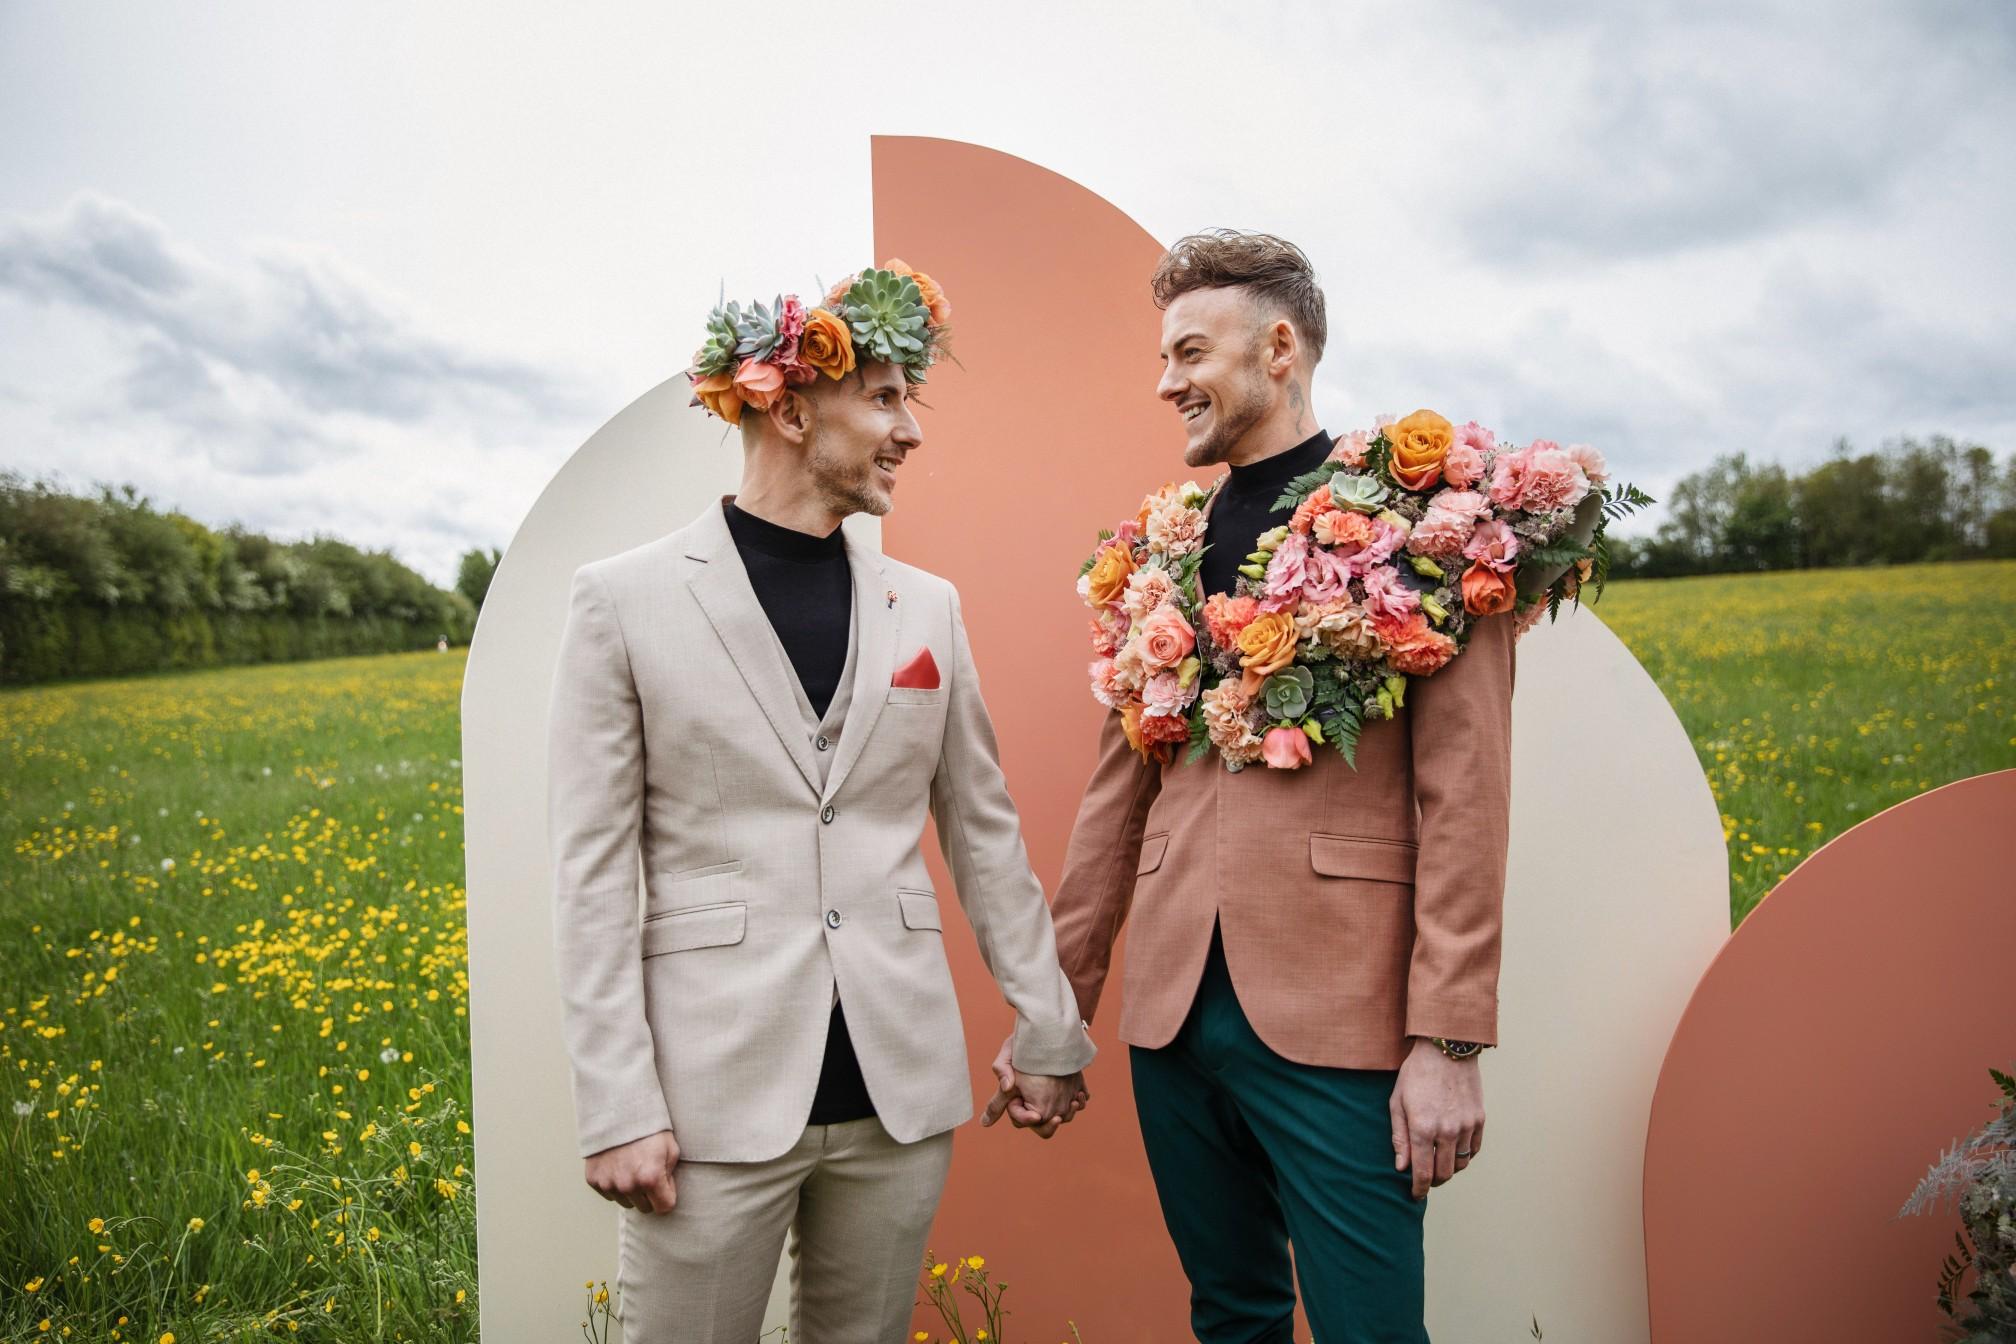 retro wedding backdrop - gay wedding ideas - groom in flower crown - unique wedding flowers - outdoor wedding ceremony